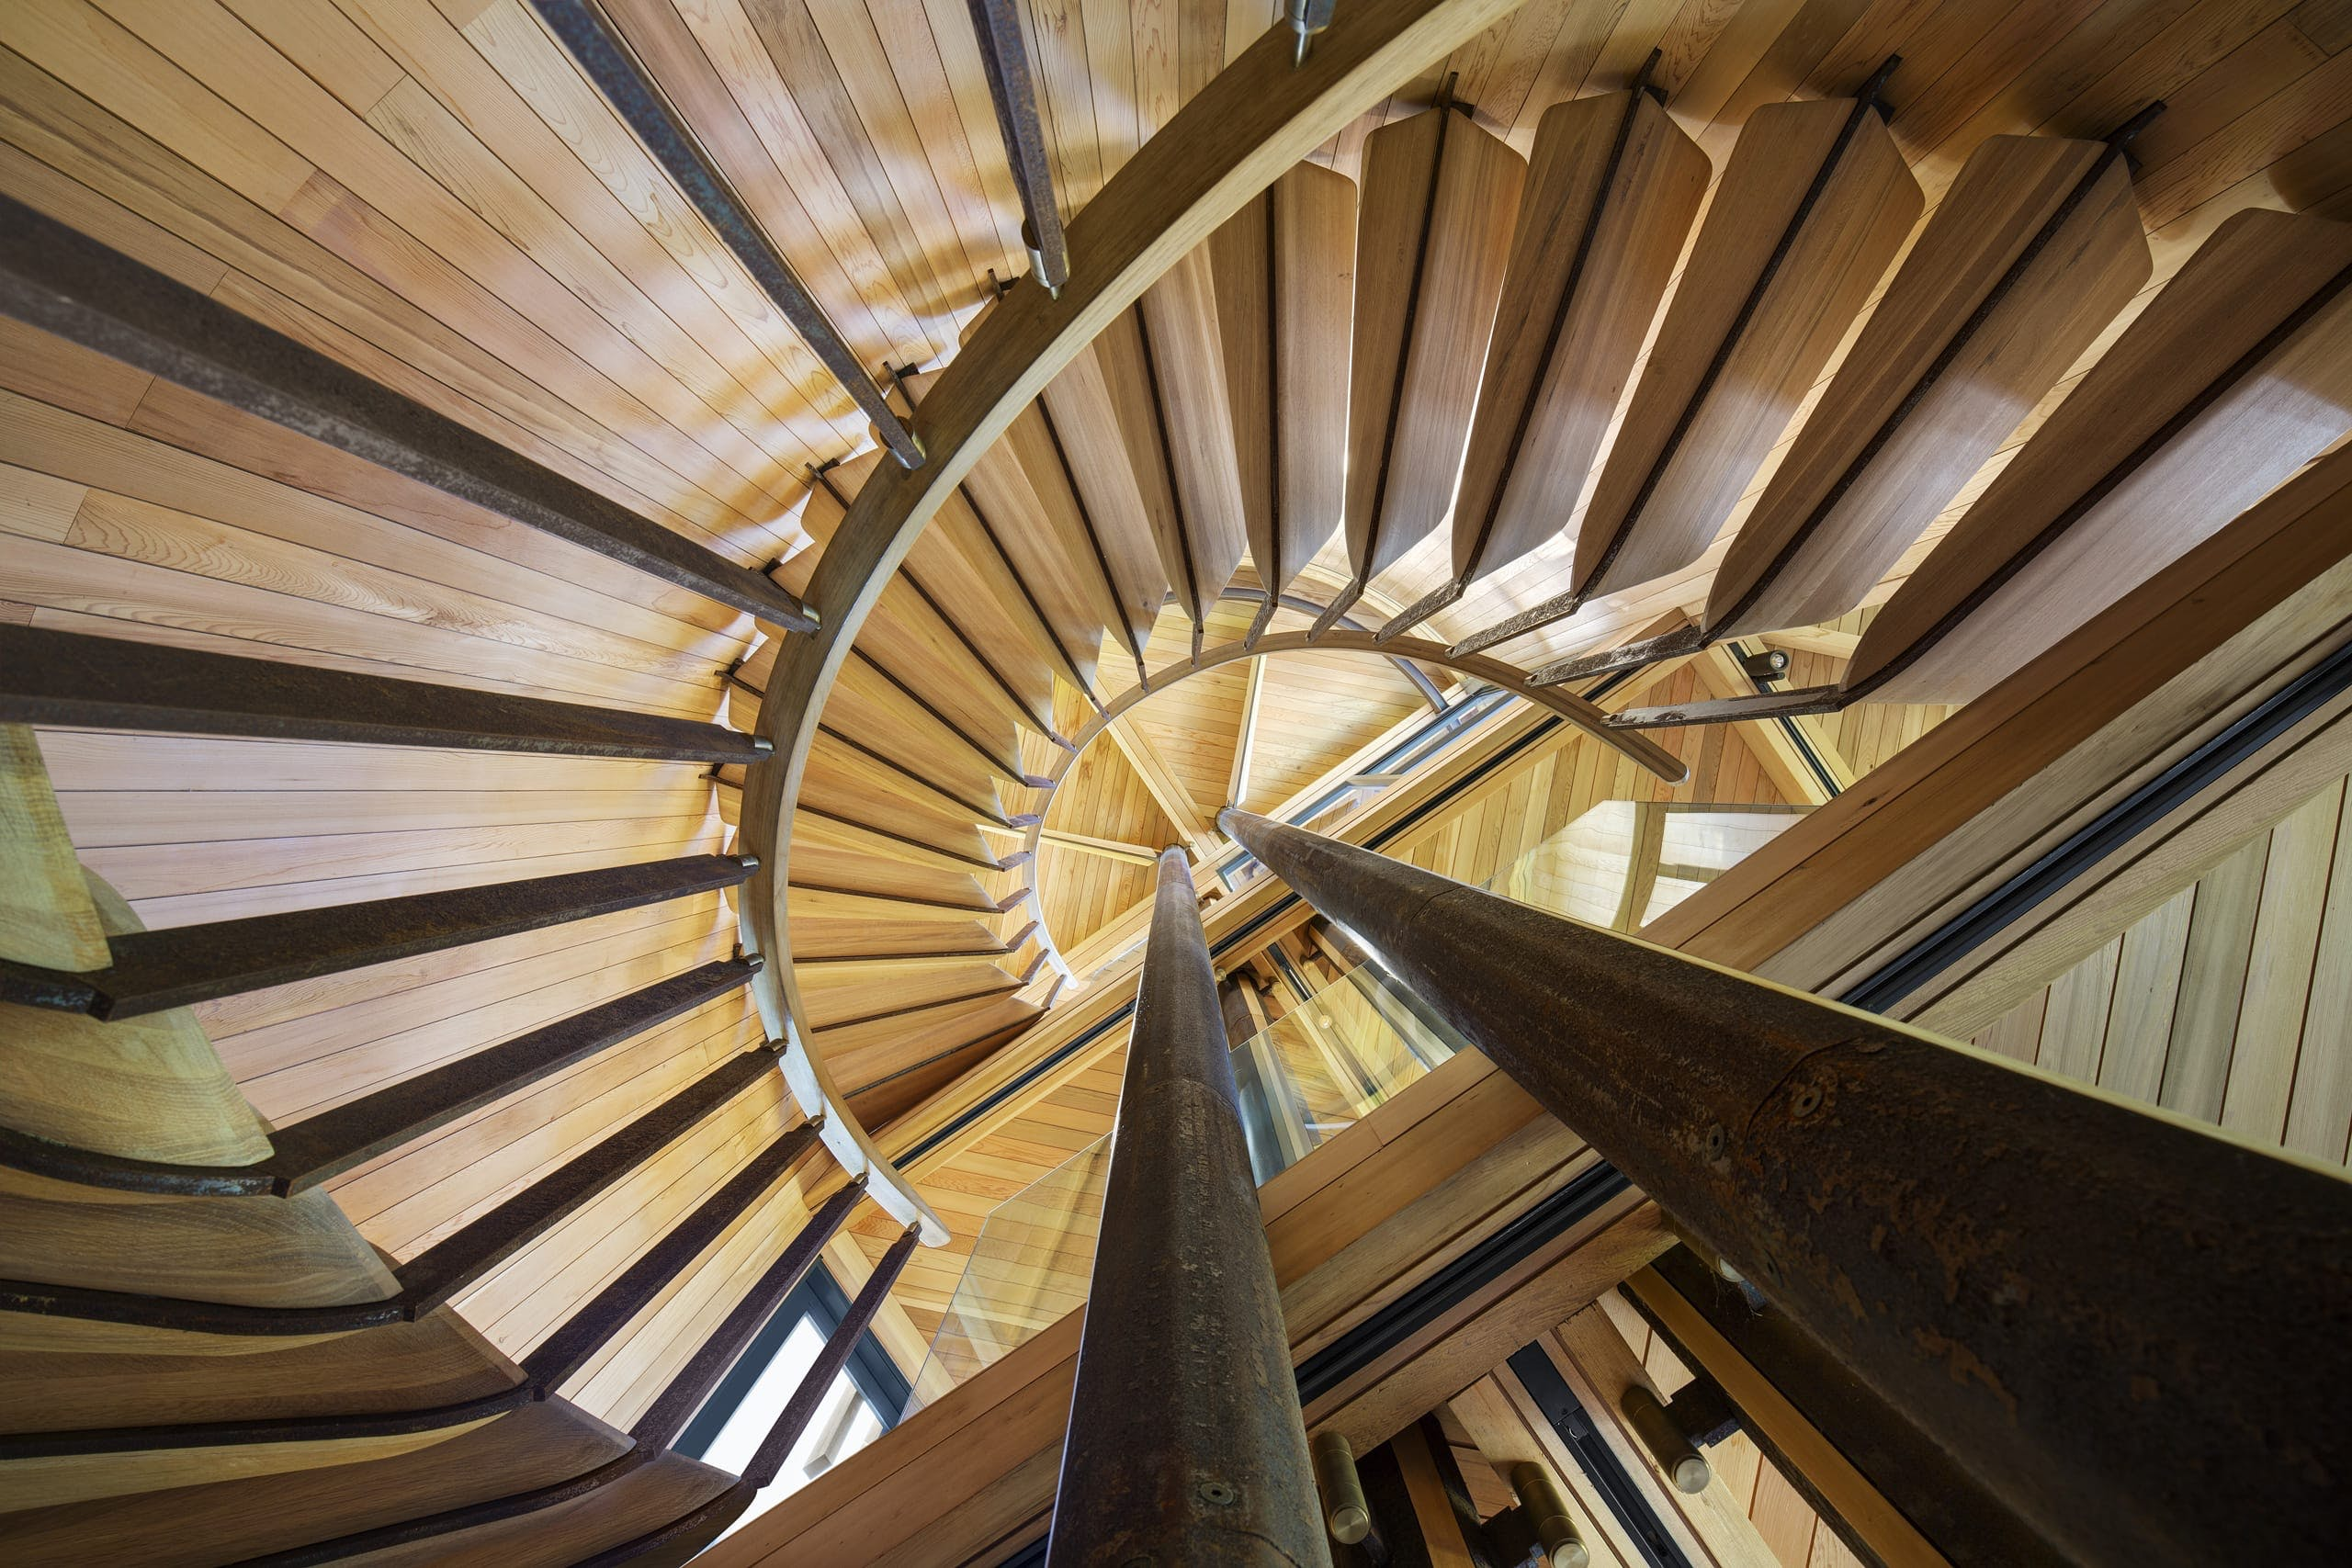 Trappe træ arkitektur spektakulær